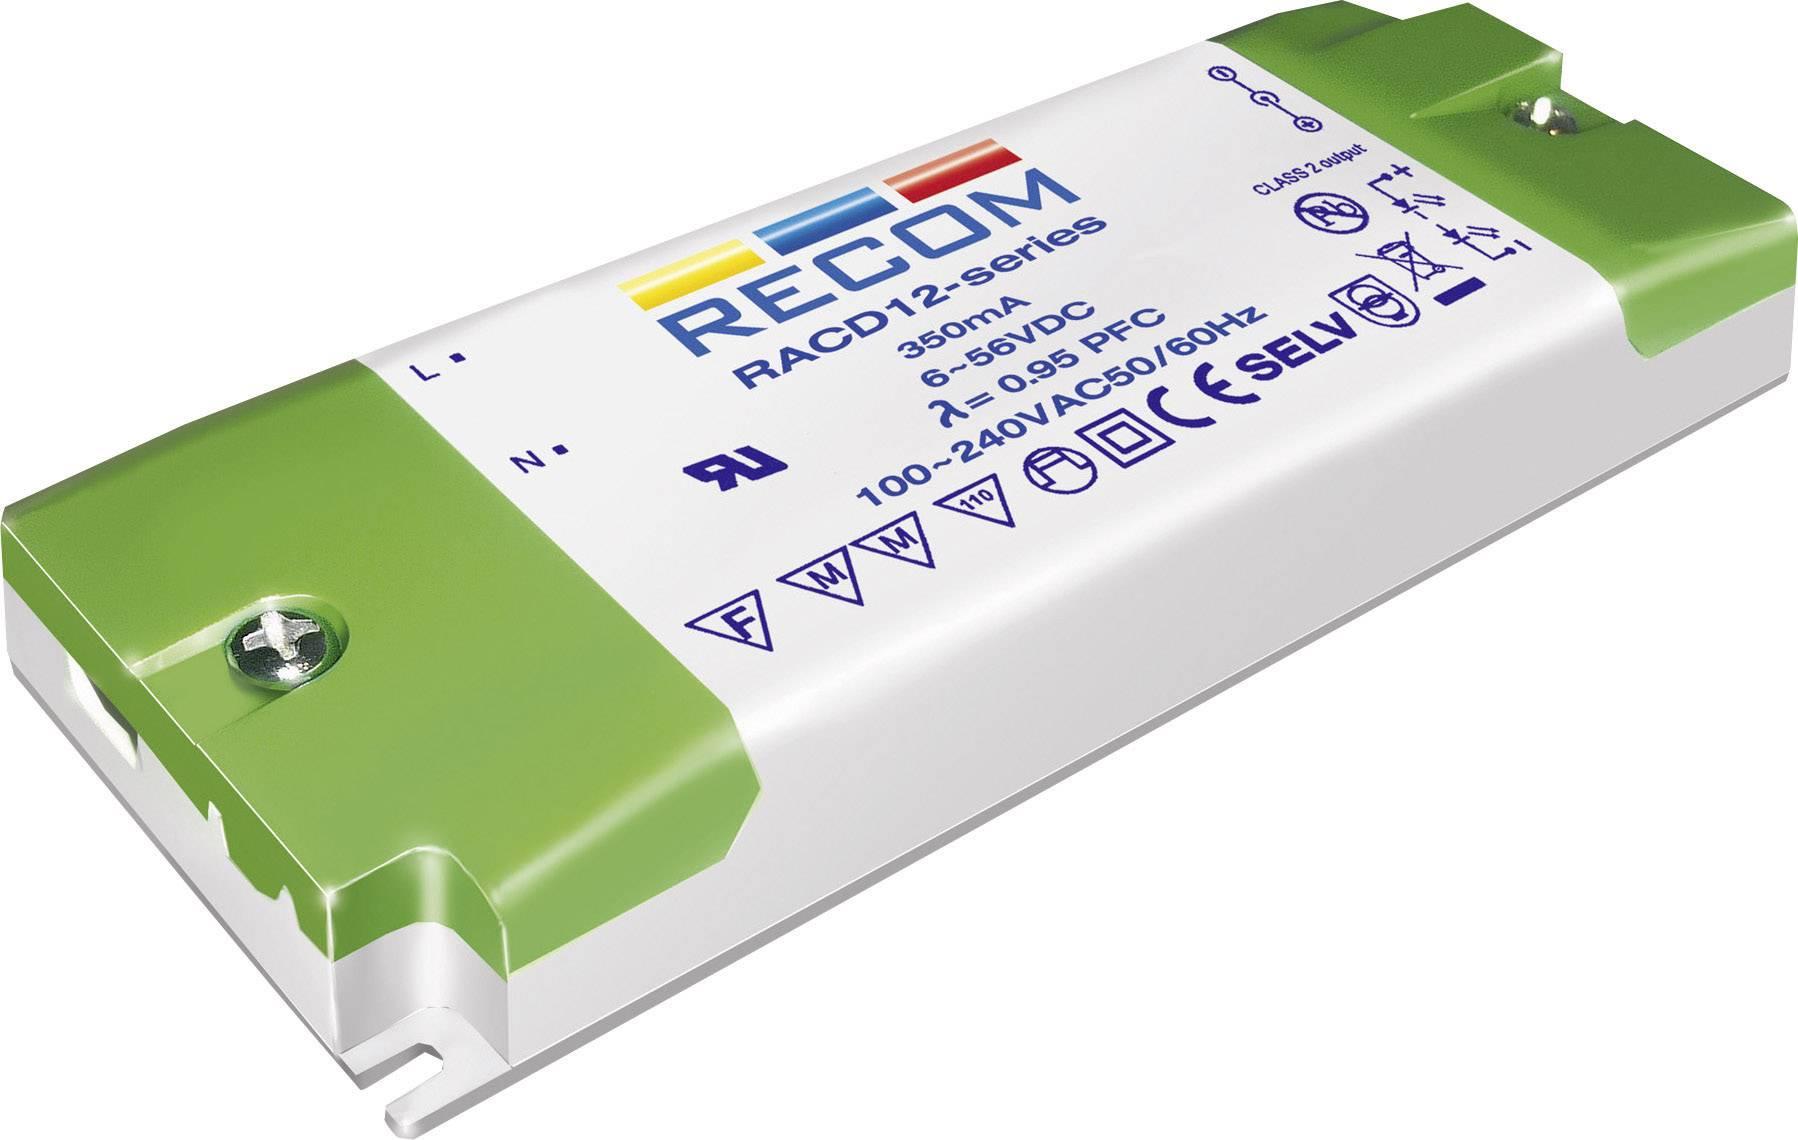 LED driver Recom Lighting RACD12-700, 12 W (max), 0.7 A, 3 - 17 V/DC